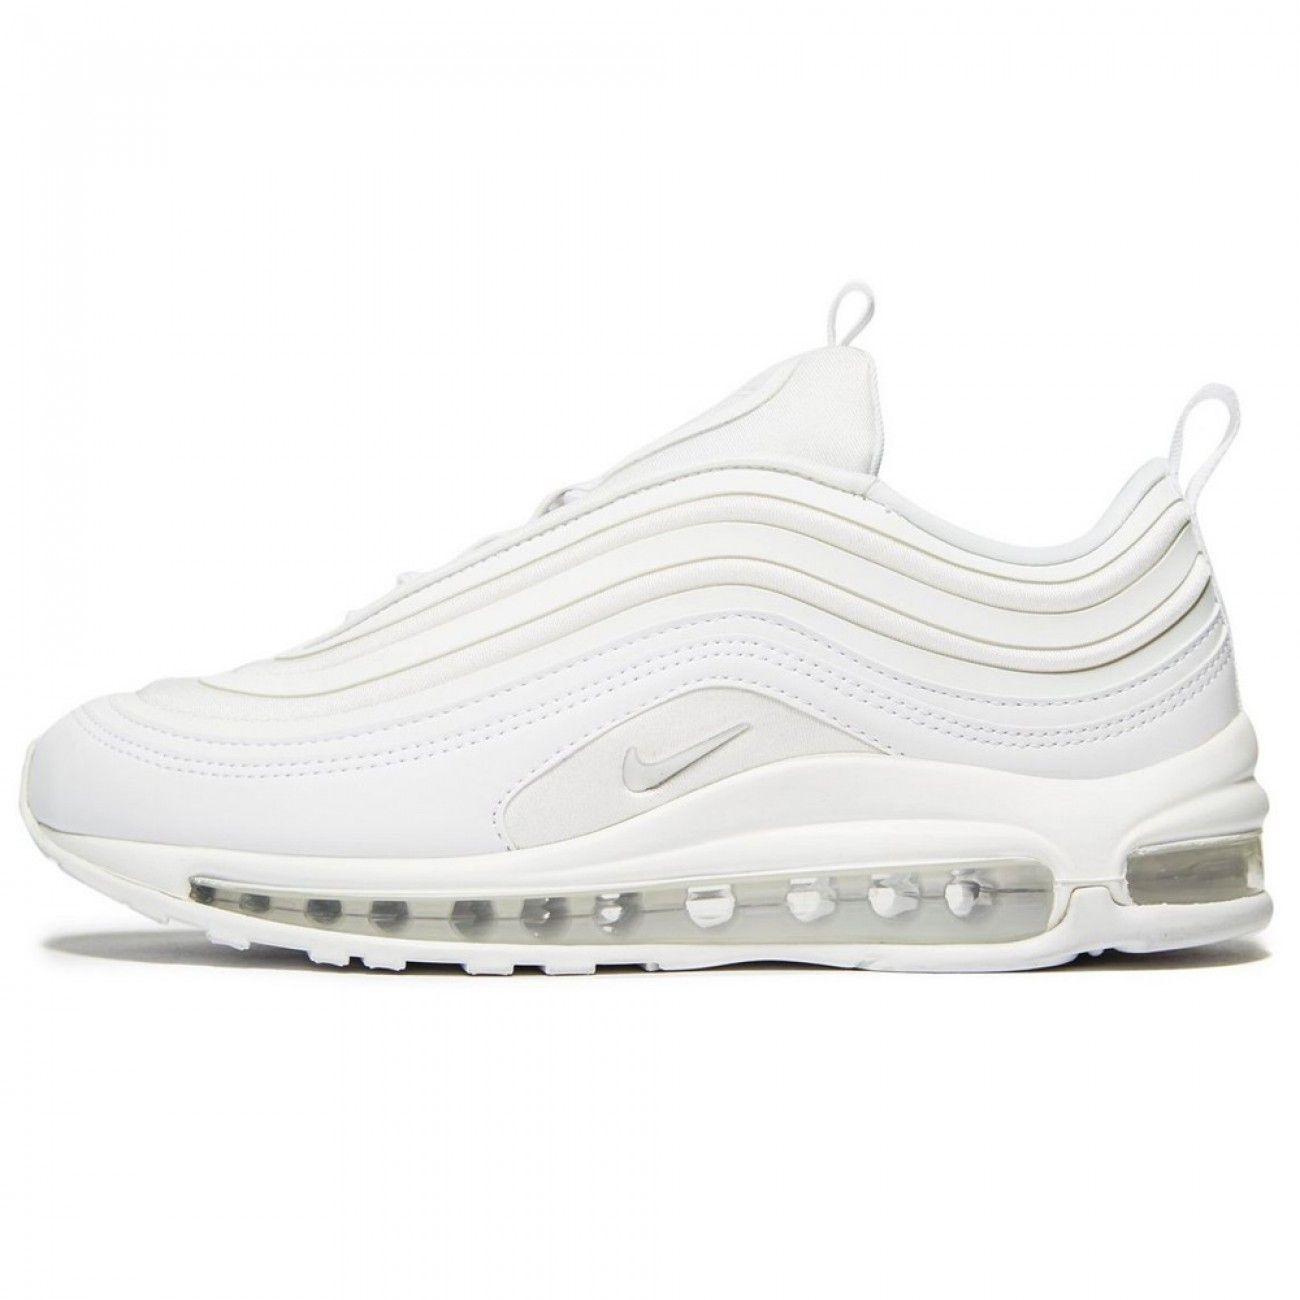 White 97s   Nike air max, Nike, Nike air